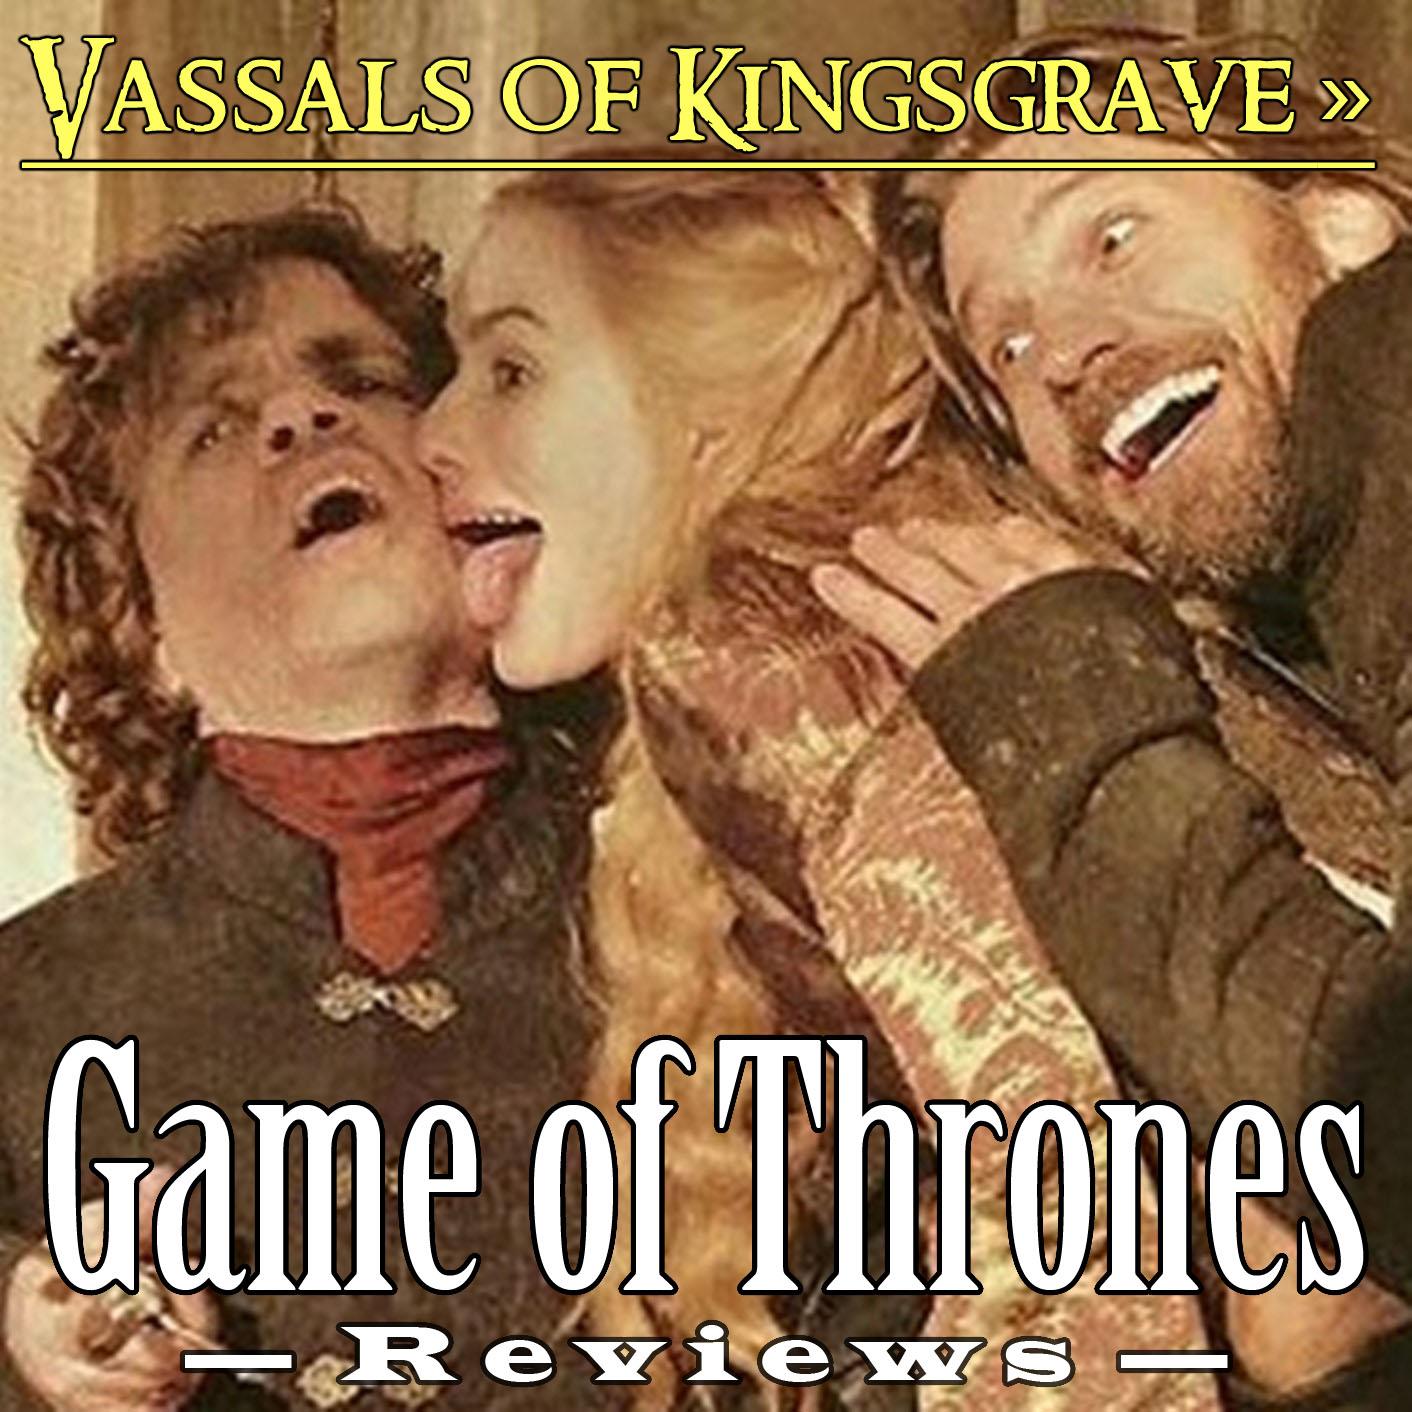 Game of Thrones – Vassals of Kingsgrave